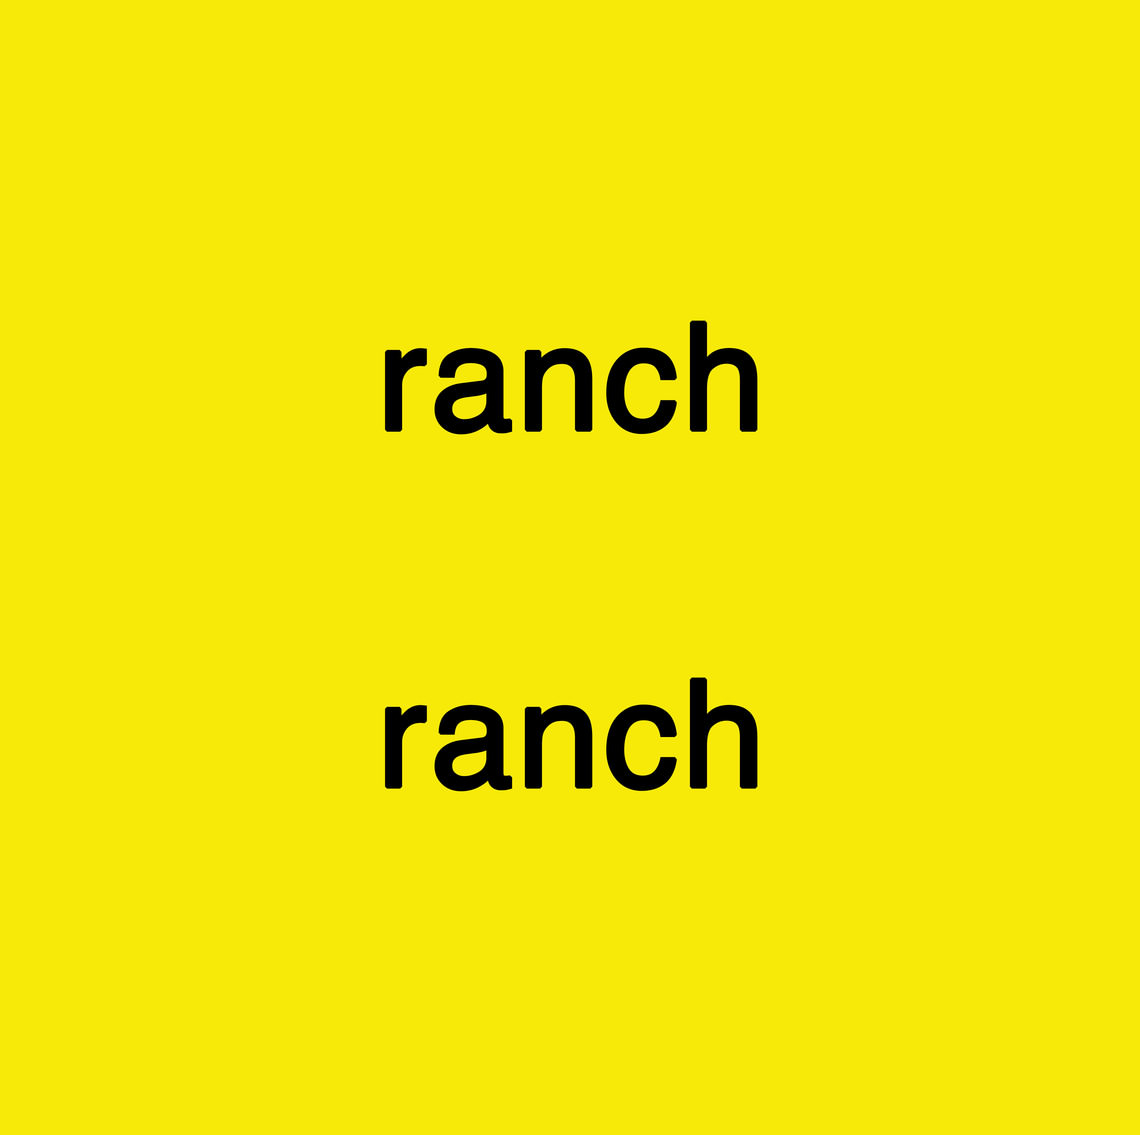 - ranch ranch